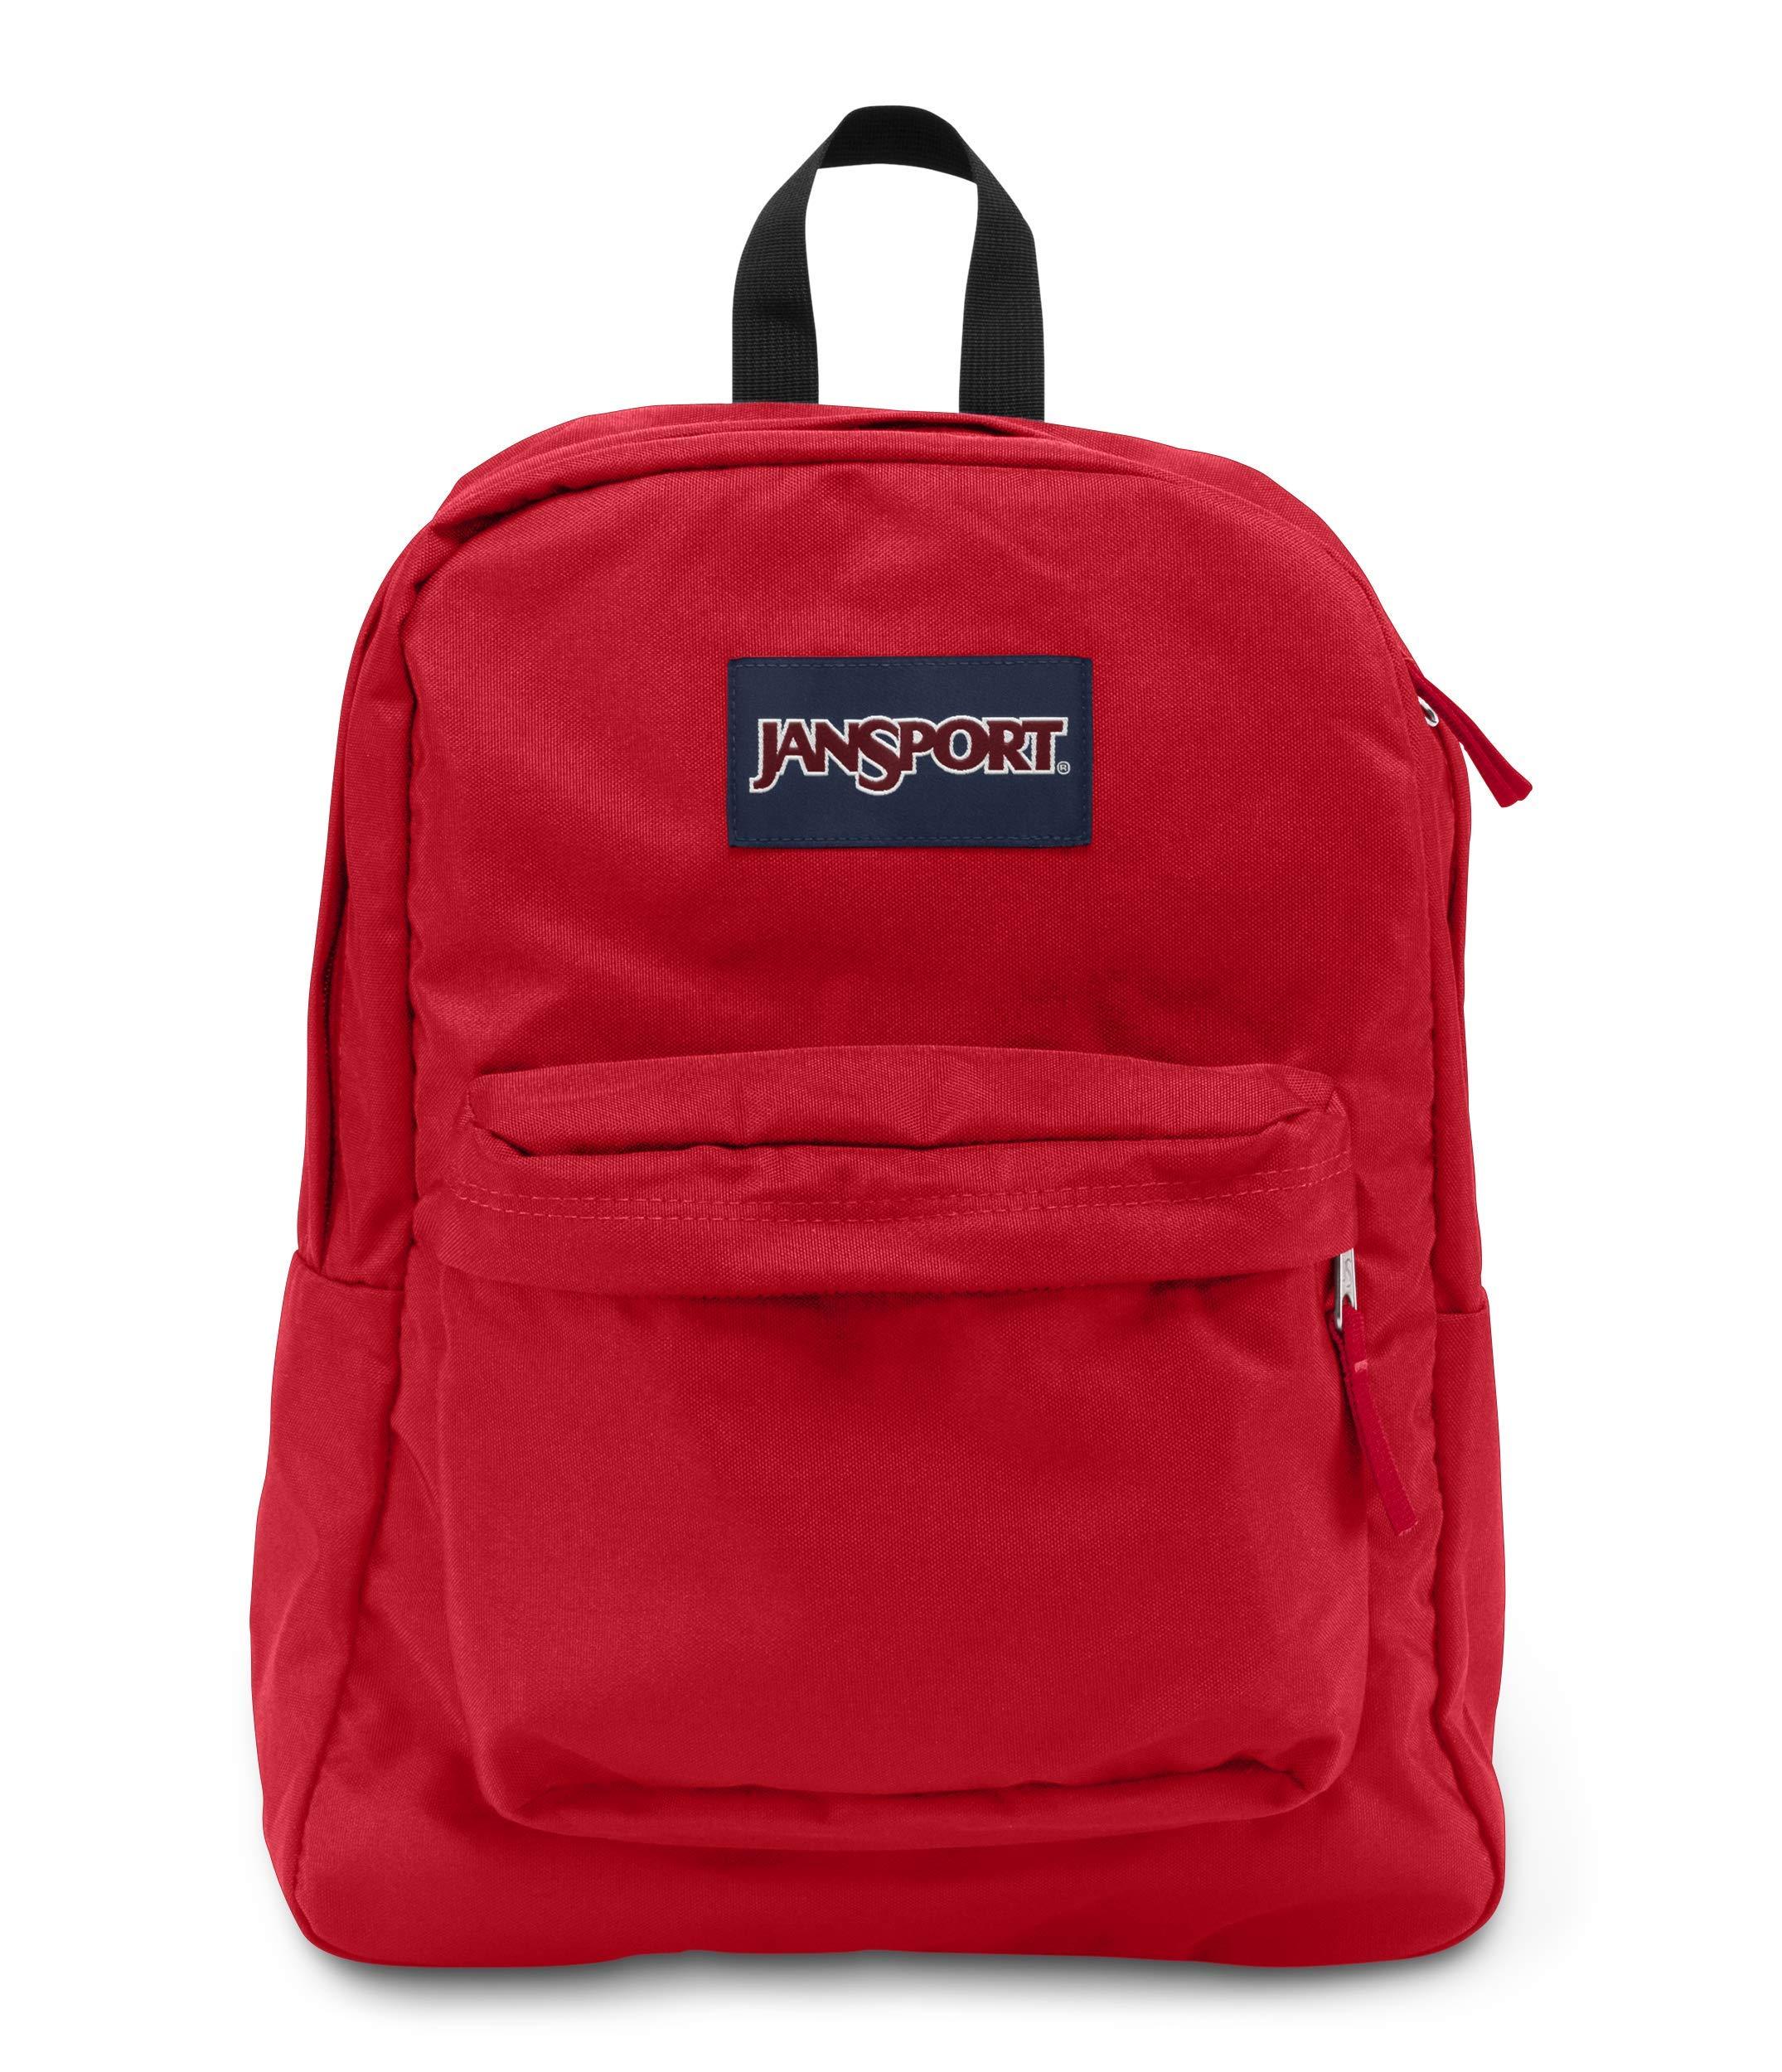 3866f94c65ae Jansport T501 Superbreak Backpack - Red Tape